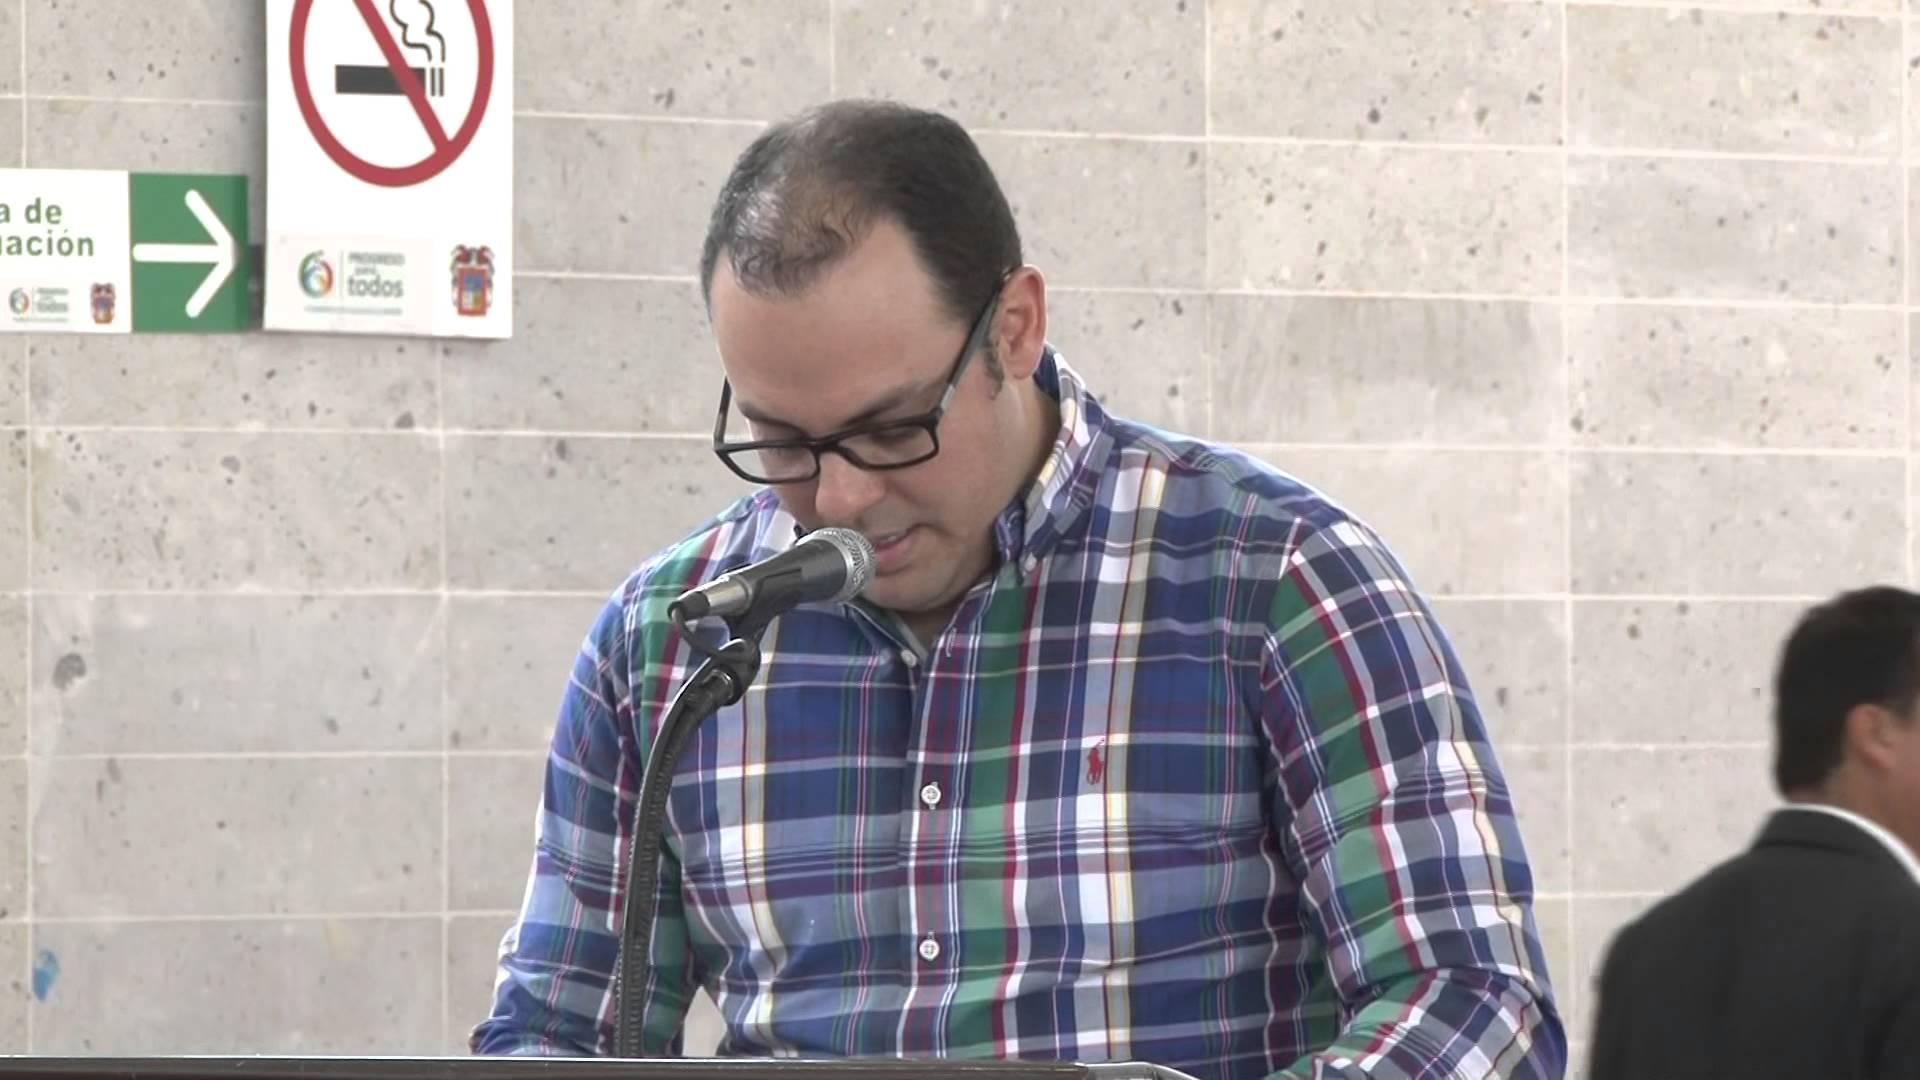 Niega funcionario entrega de calentadores a cambio de afiliación priista